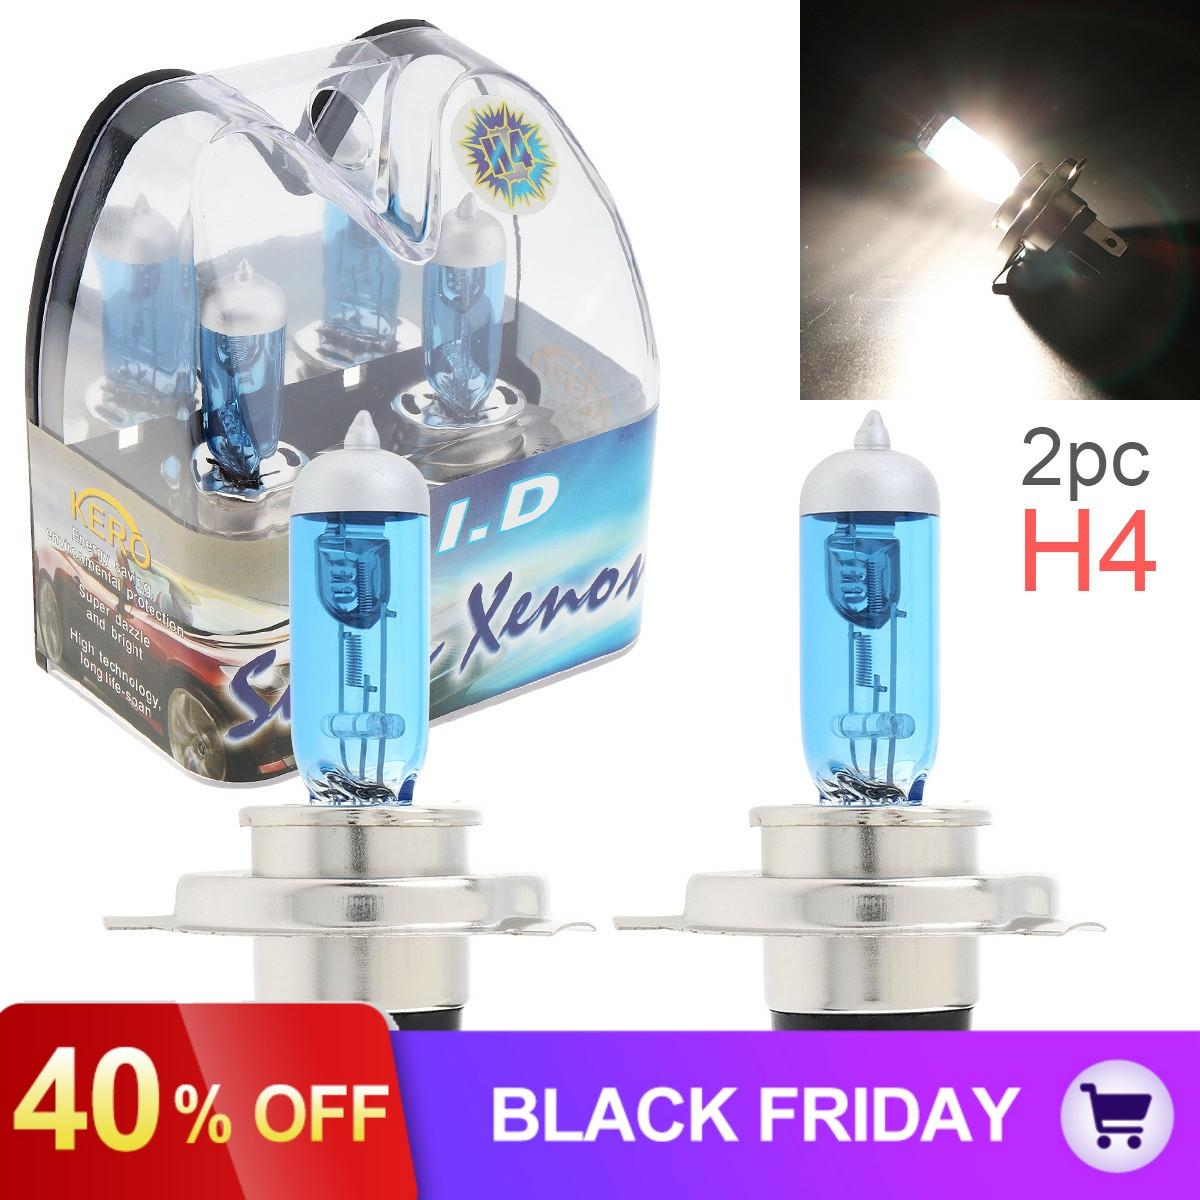 2pcs/lot 12V H4 60/55W 6000K White Light Super Bright Car Xenon Halogen Lamp Auto Front Headlight Car Fog Light Bulb